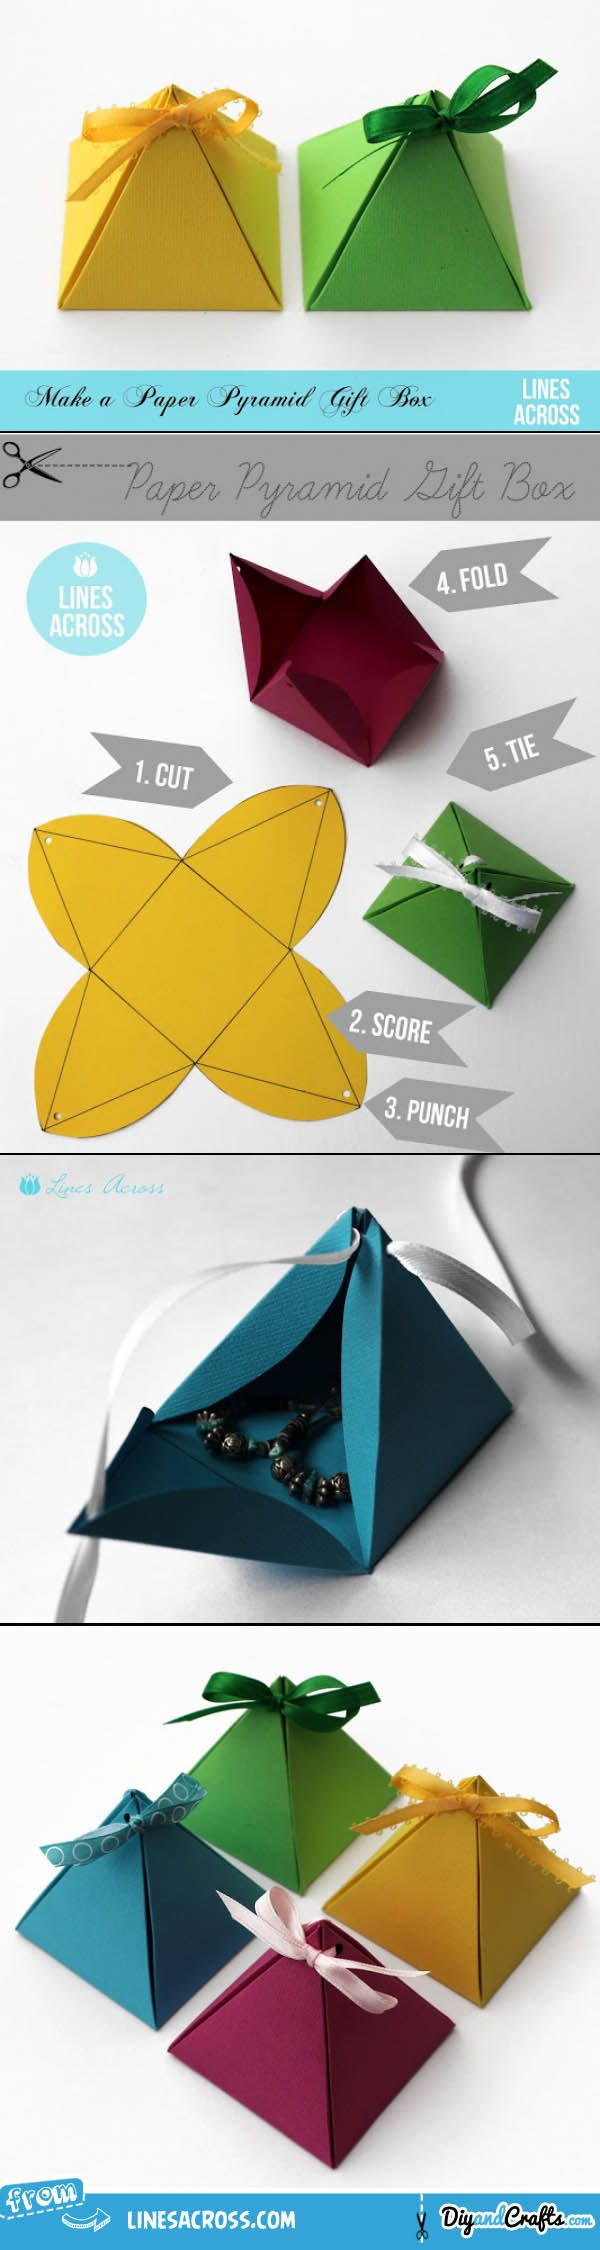 Paper Pyramid Gift Boxes | DIY | DIY Crafts Club